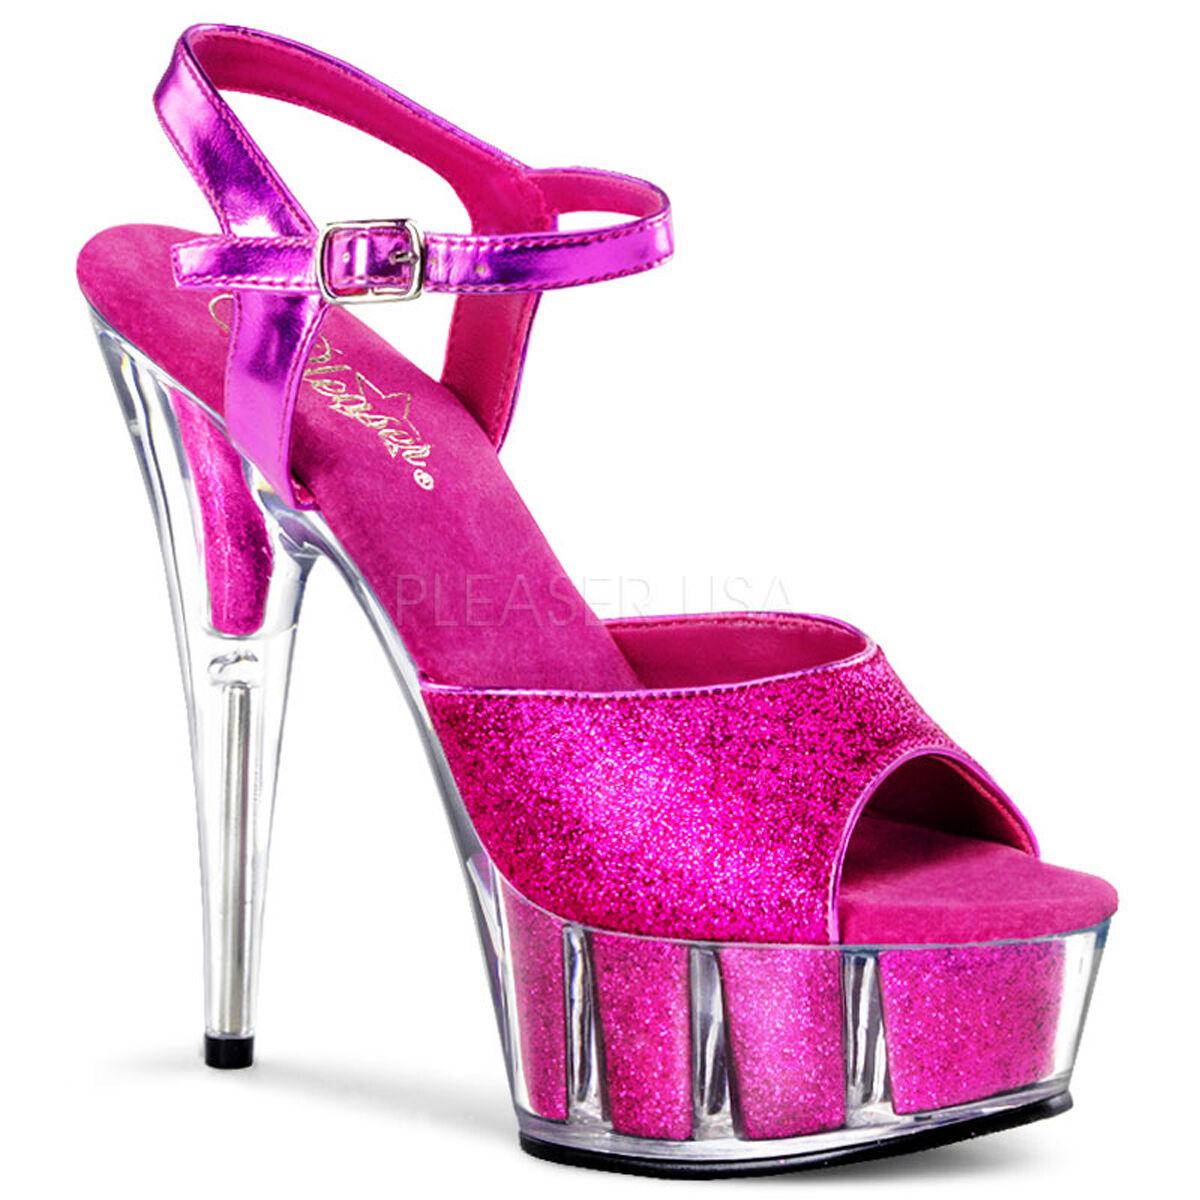 PLEASER Sexy Hot Pink Glitter Platform 6